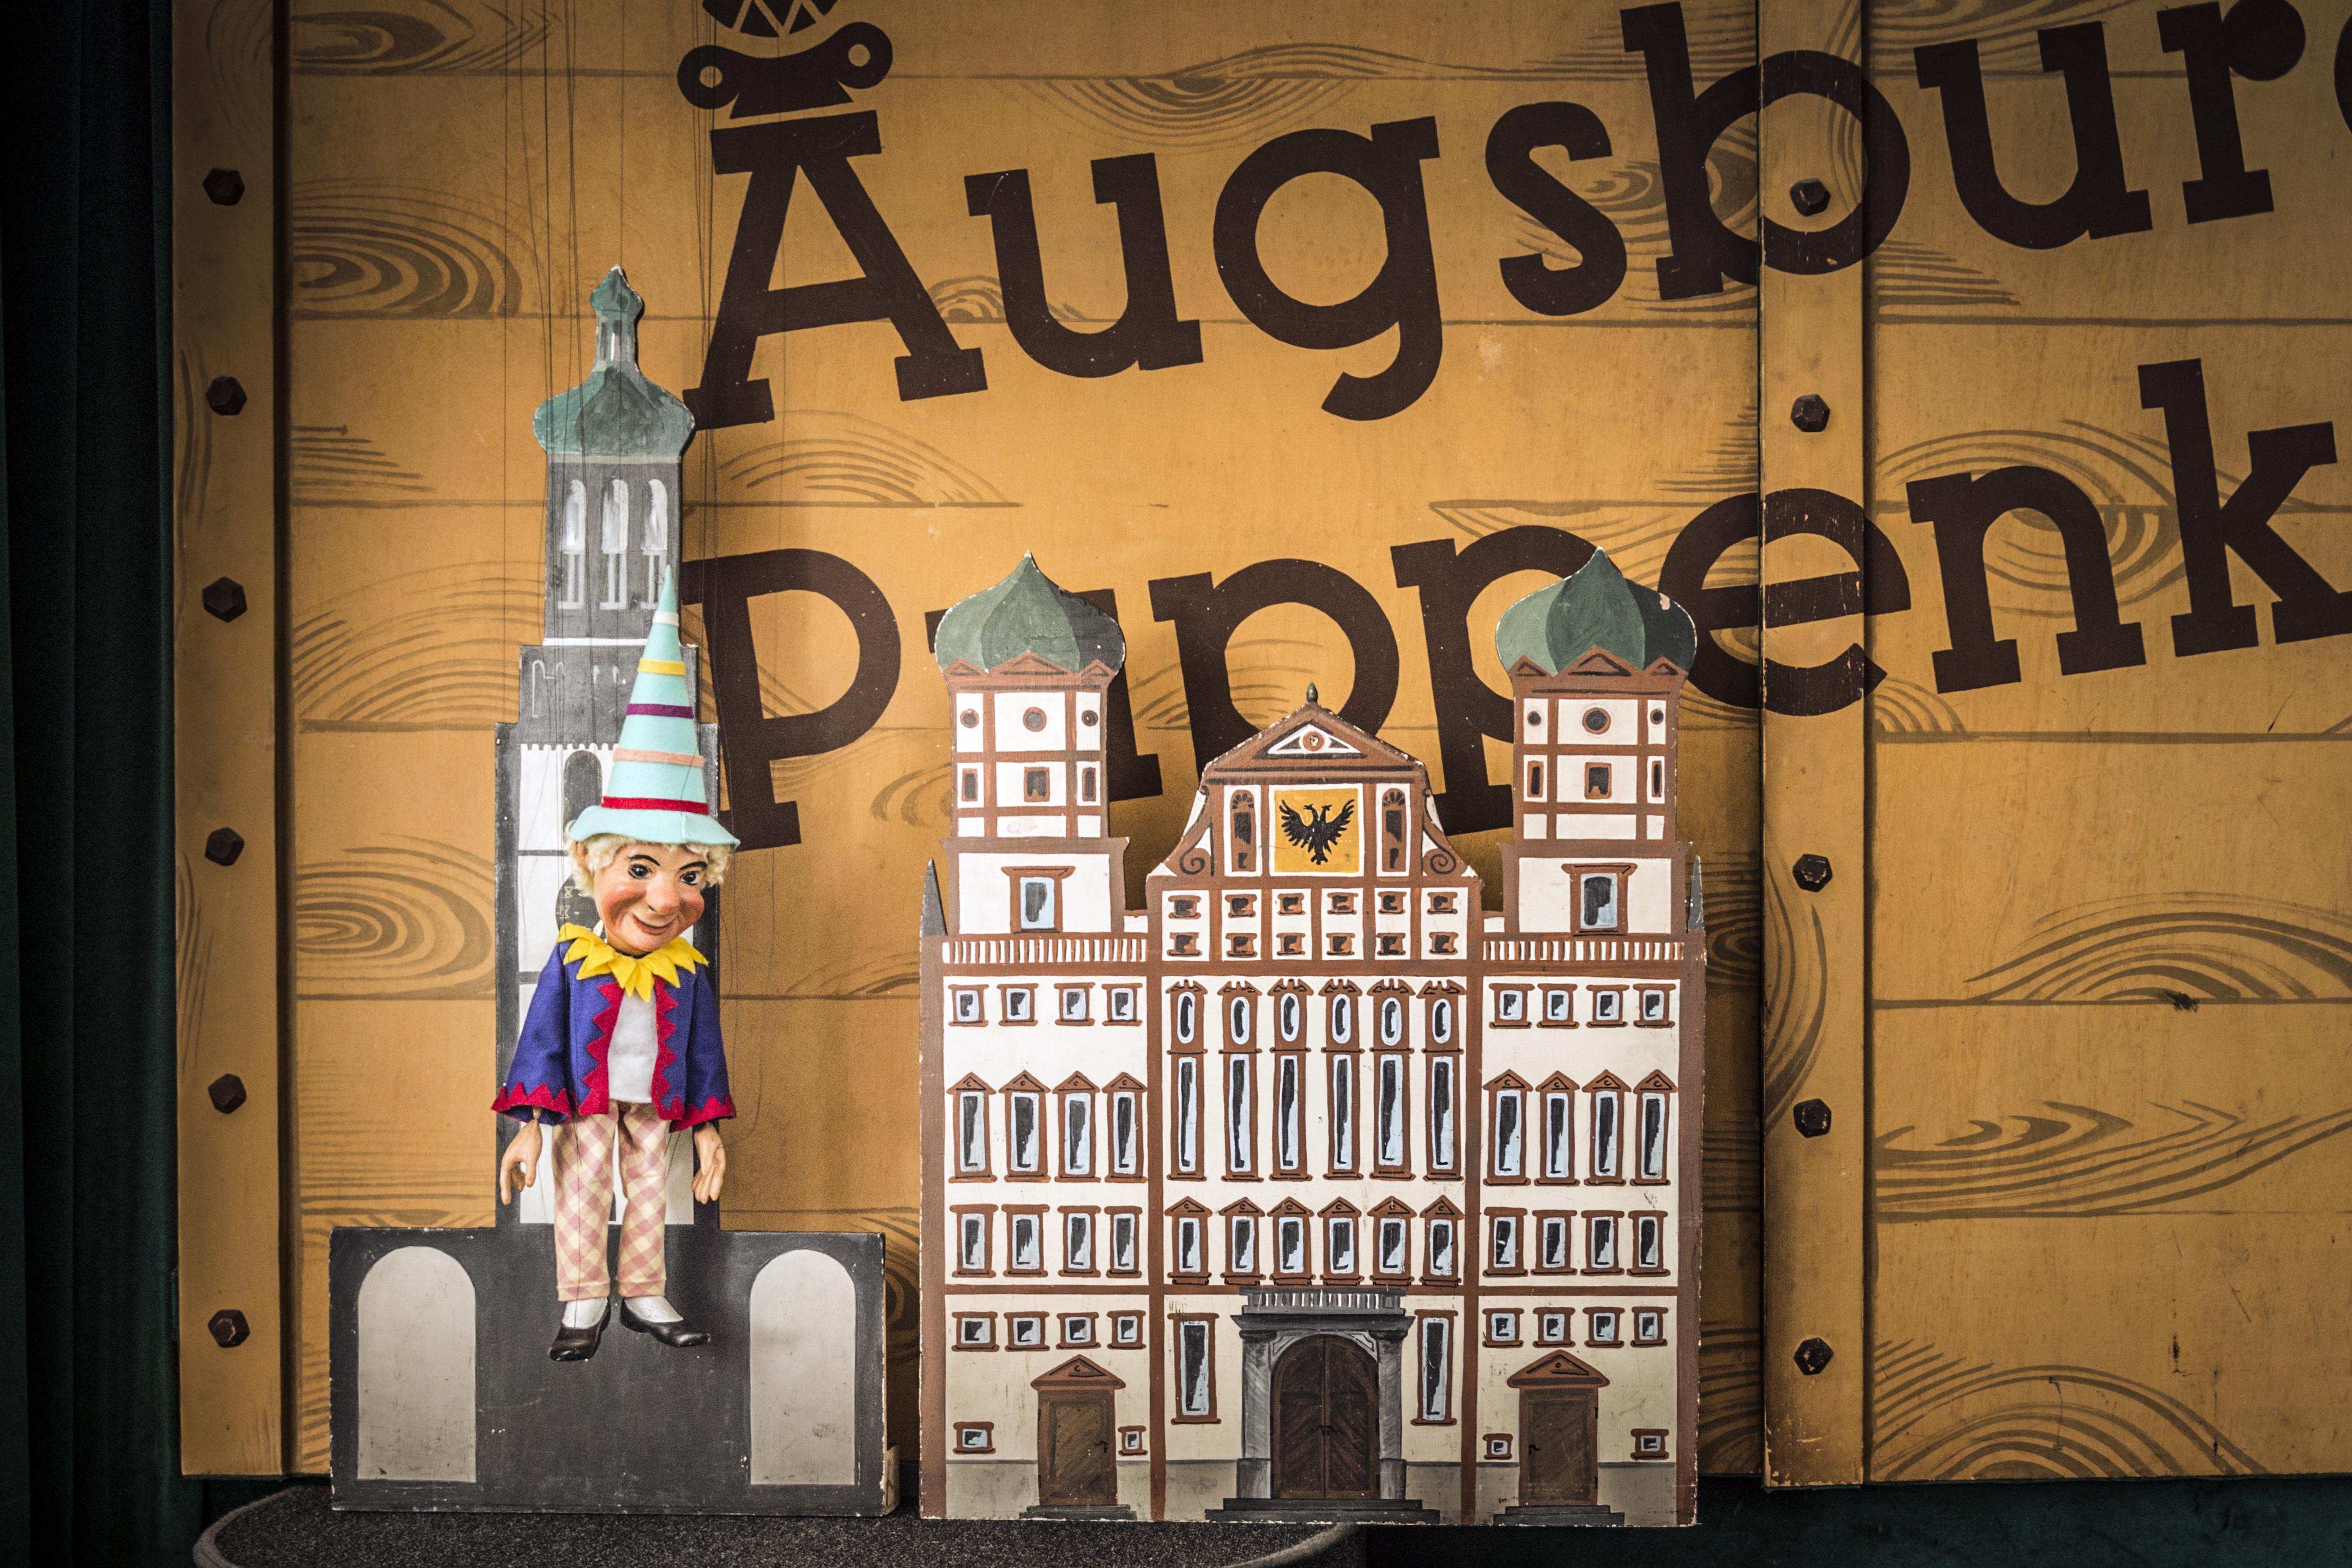 Jim Knopf Ausmalbilder Genial Ausmalbilder Jim Knopf Luxus Augsburger Puppenkiste Urmel & Co Sammlung